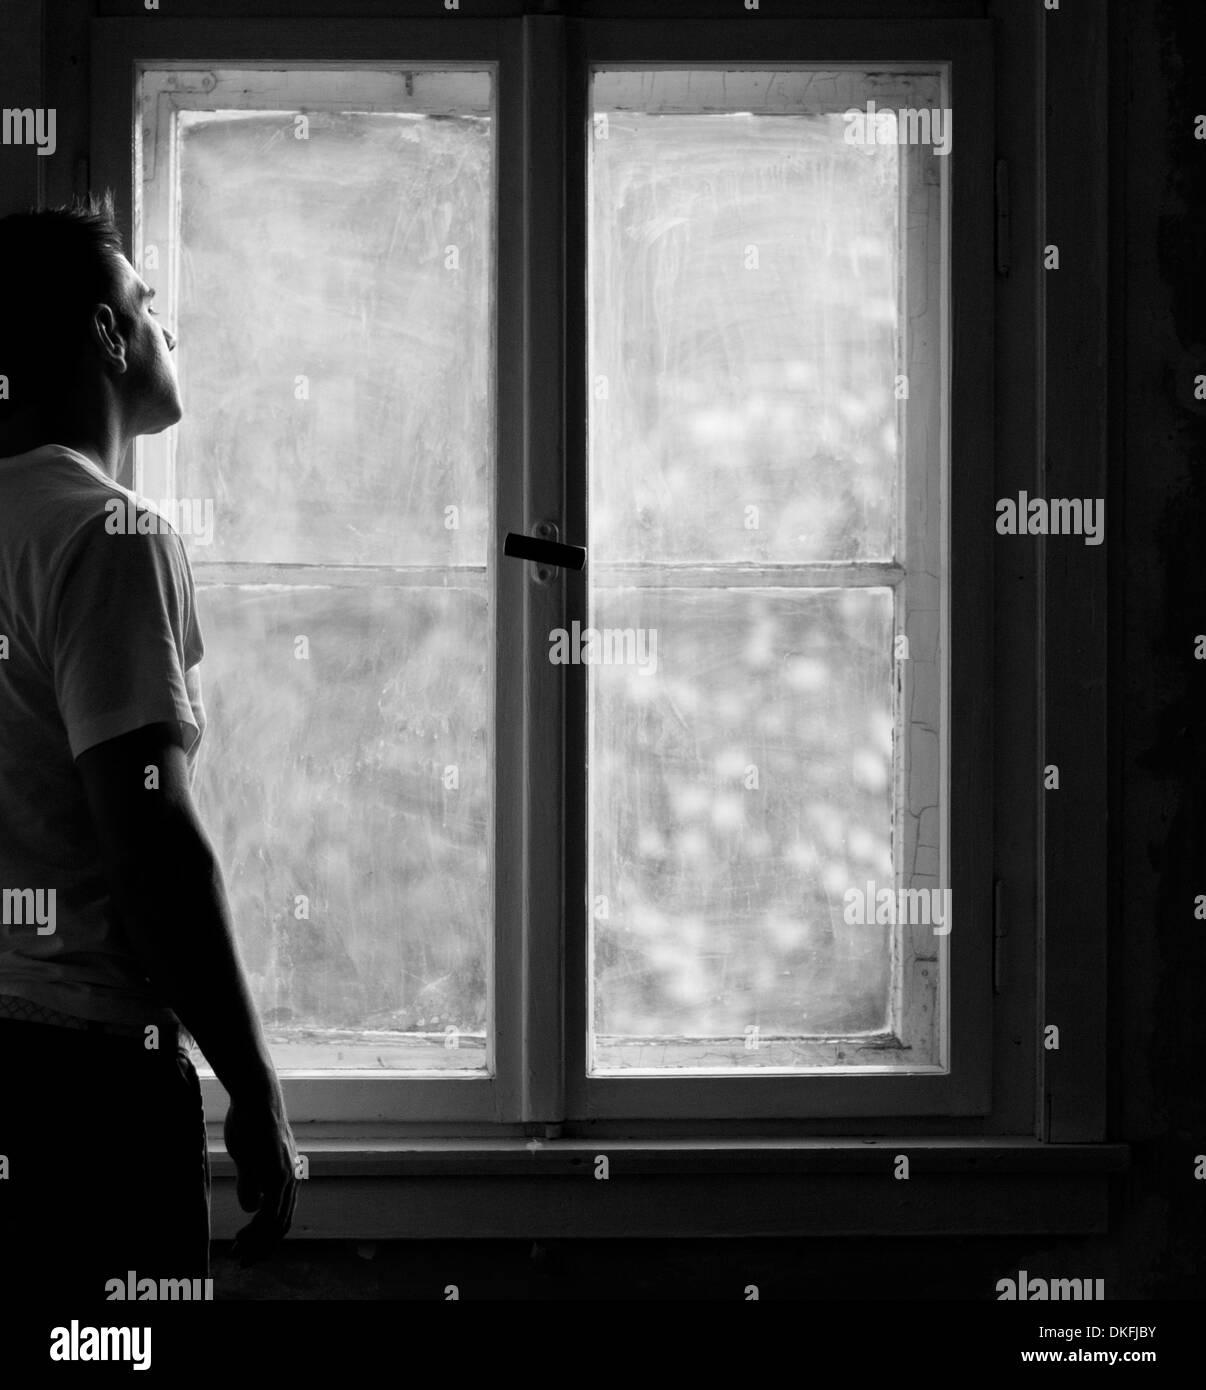 Man standing at window - Stock Image